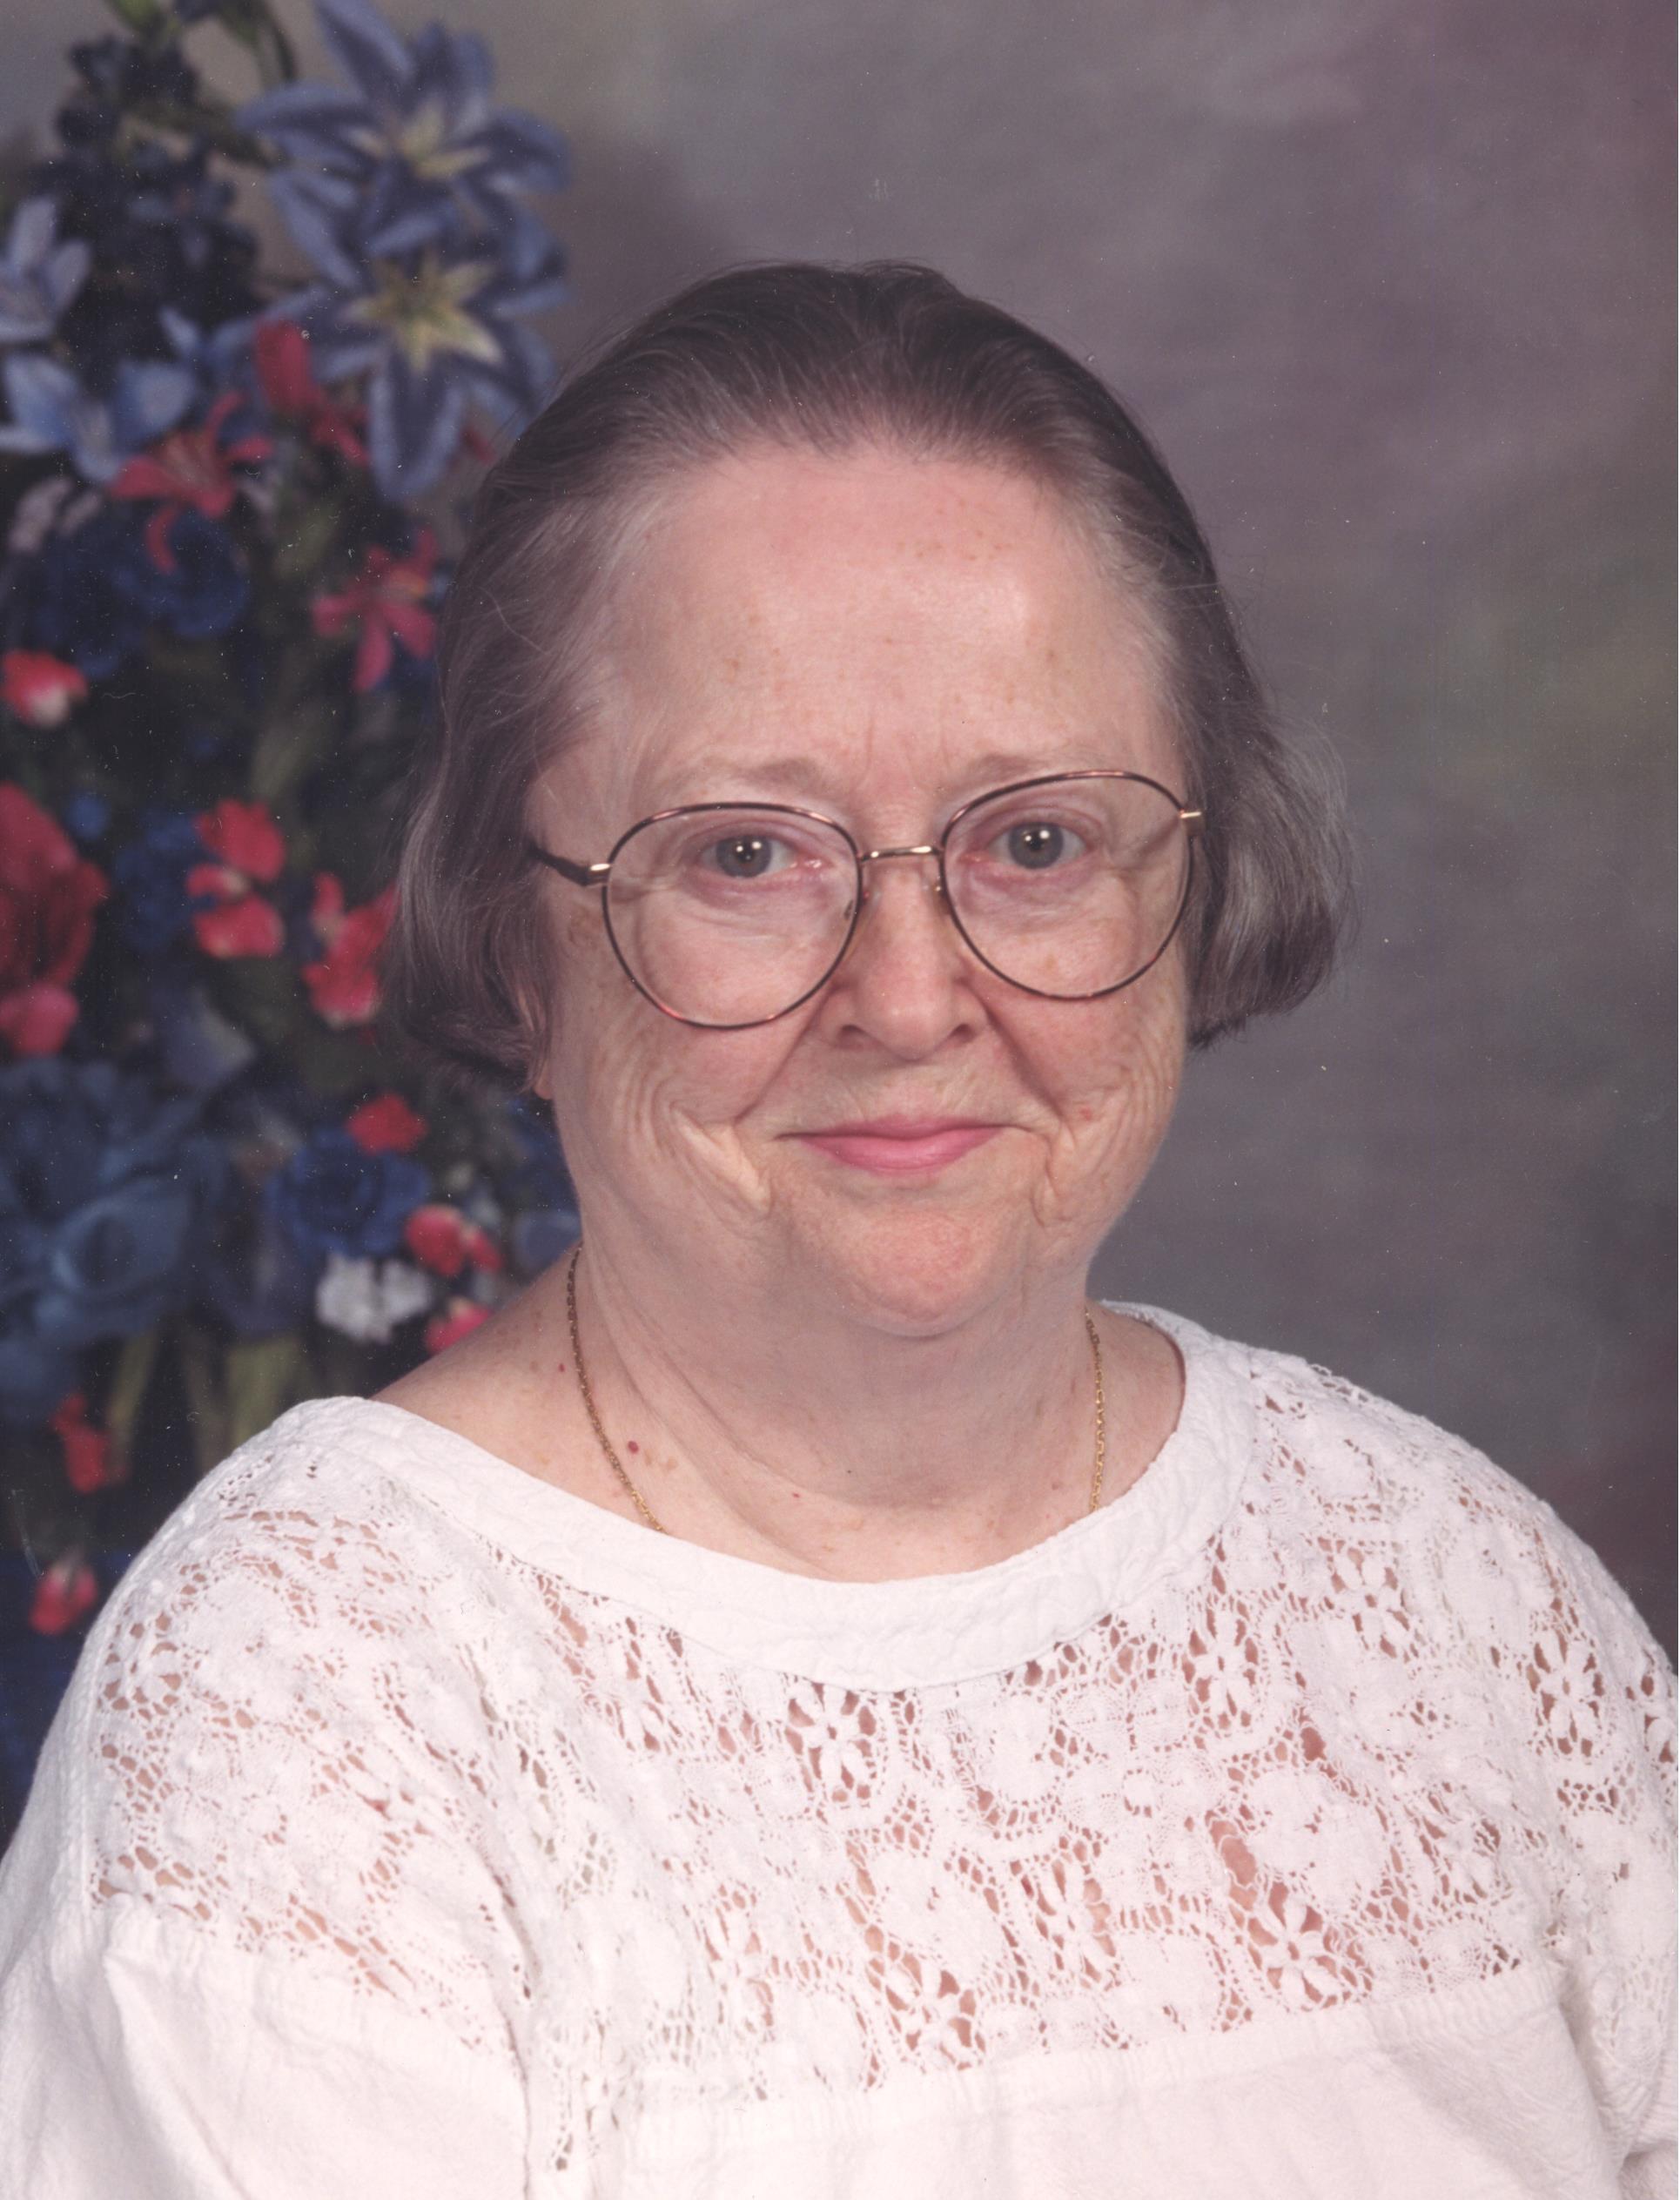 Phyllis Ann Judge